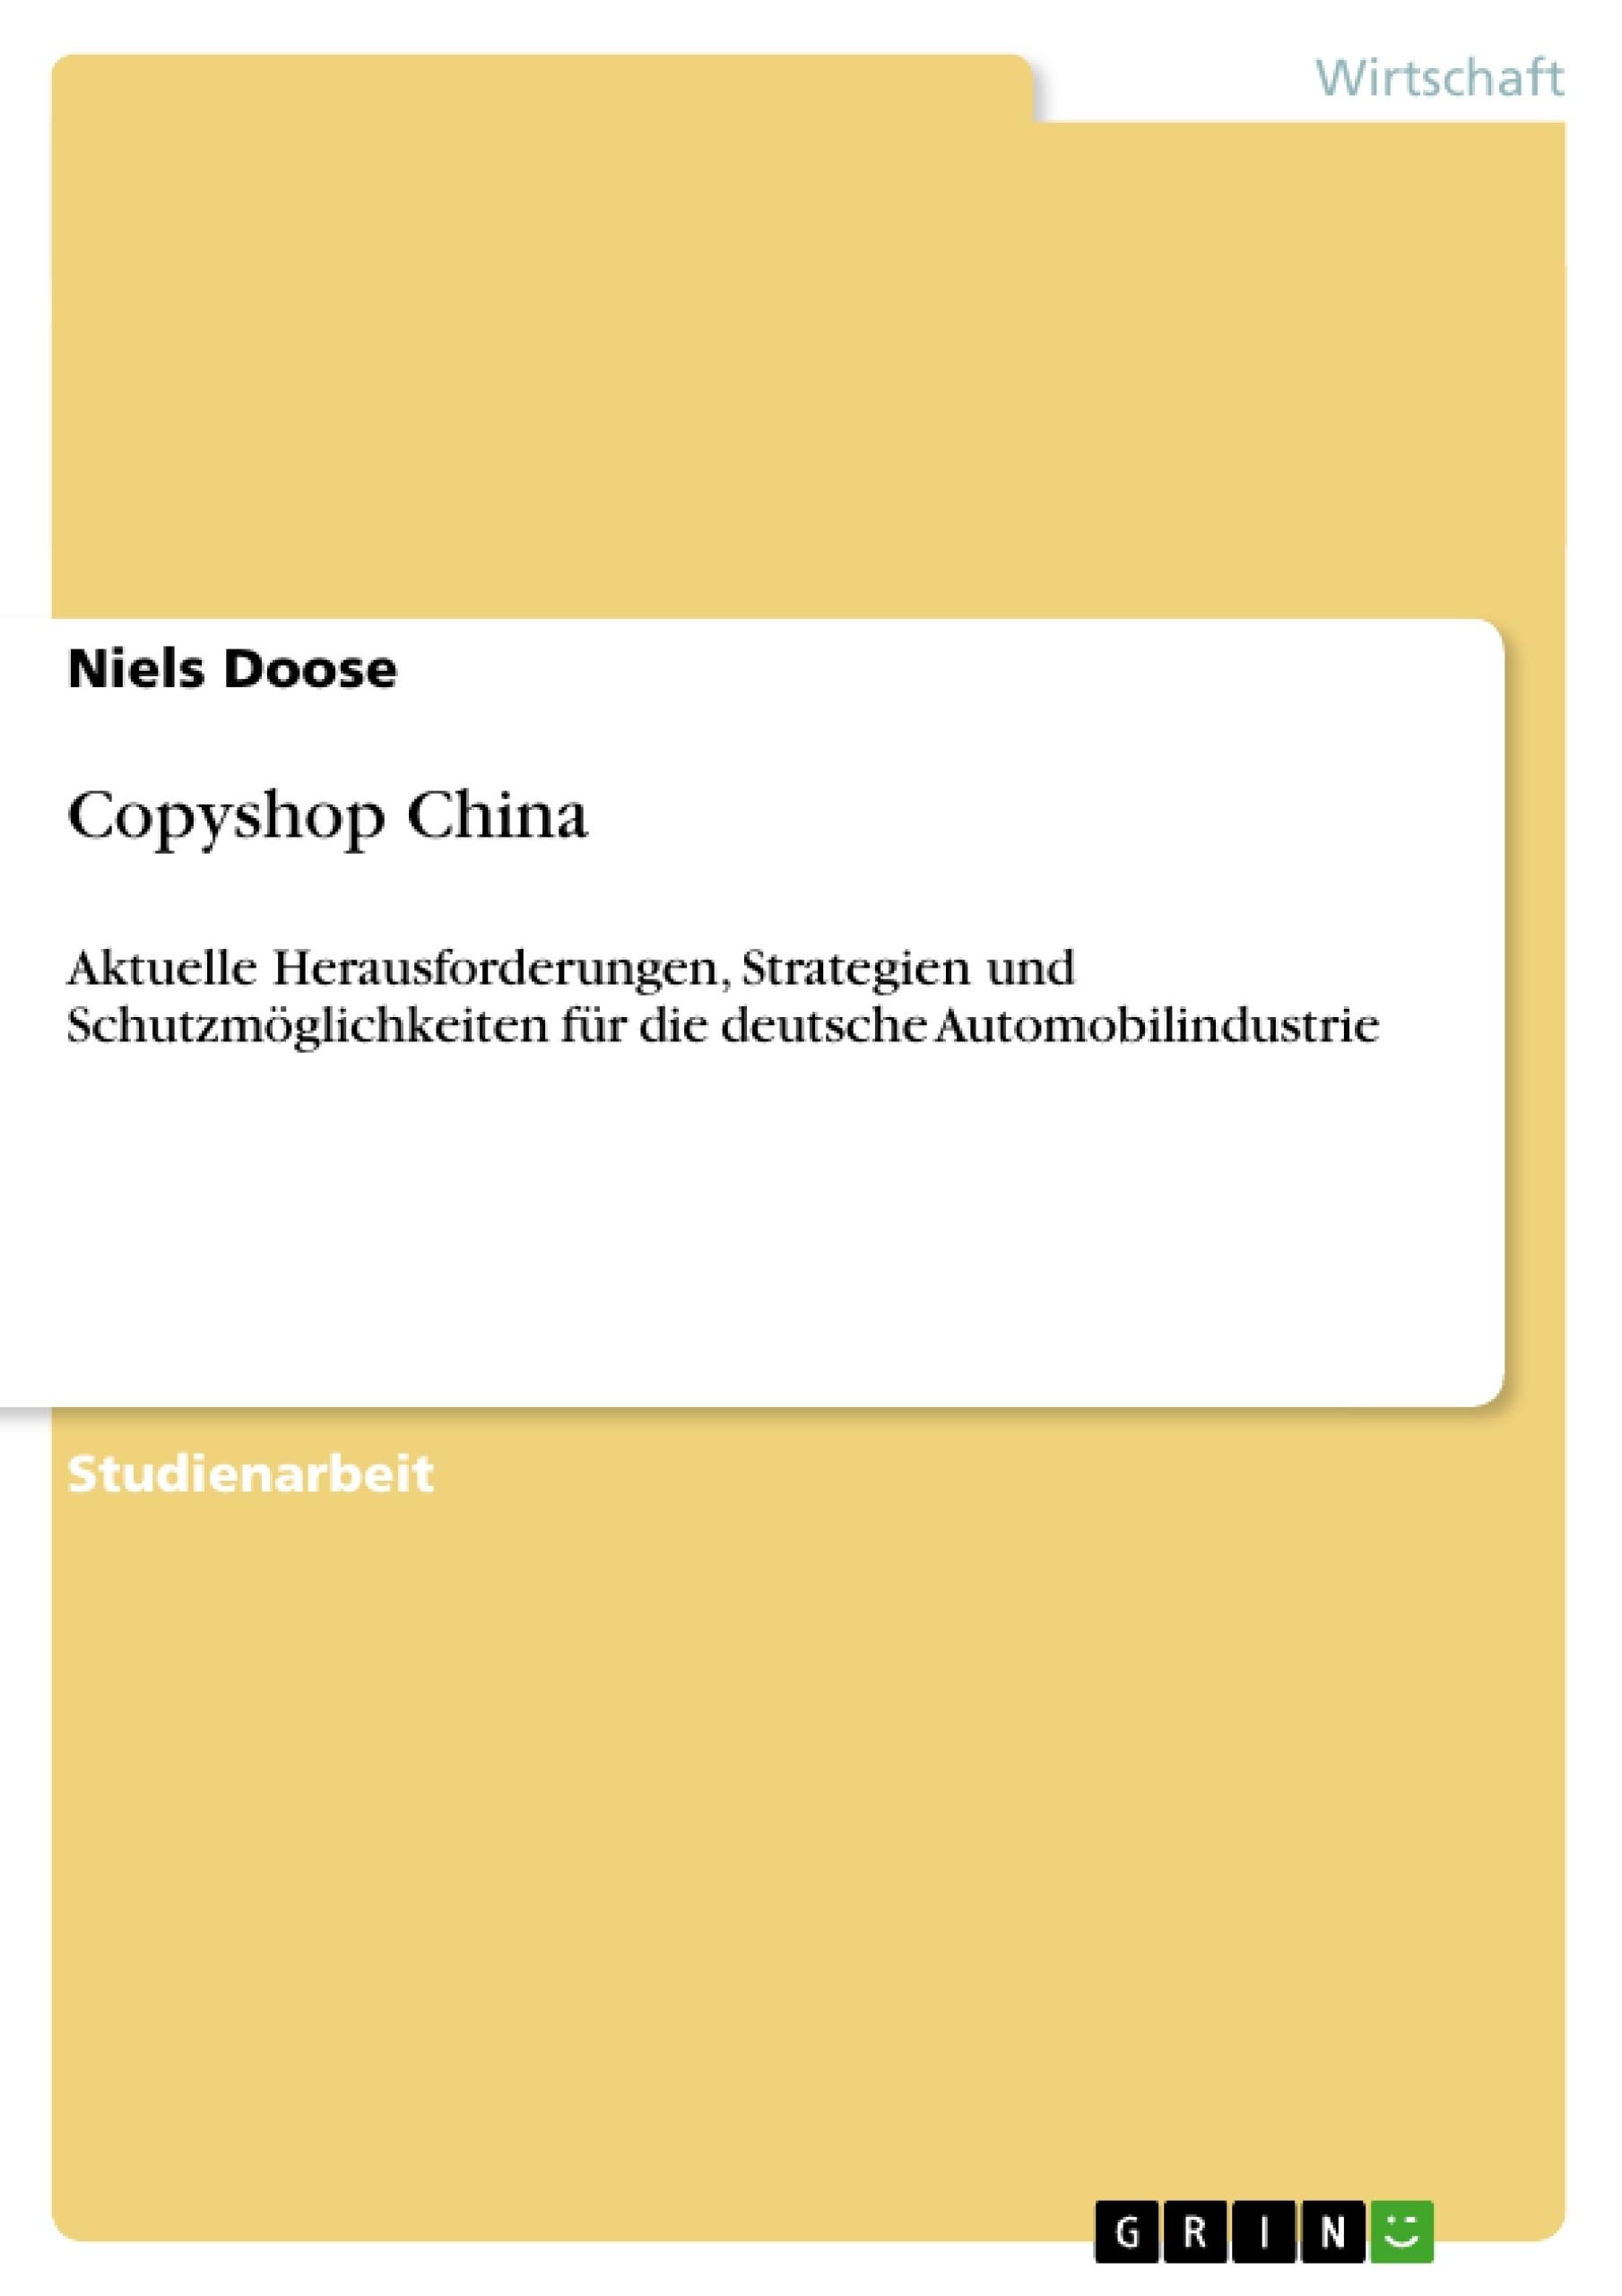 Titel: Copyshop China